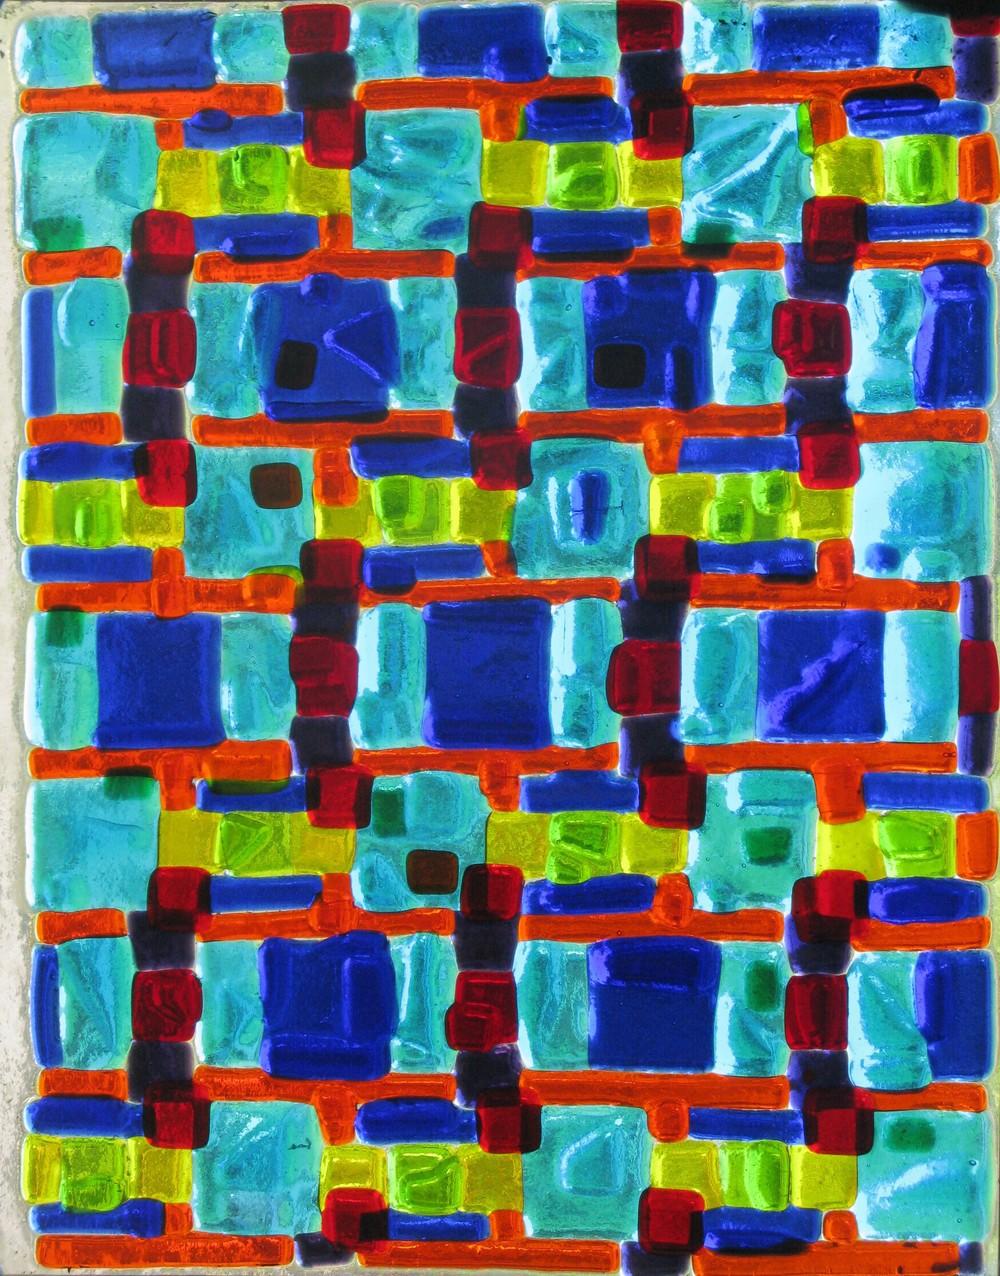 Liviu_glass_Playfull_pattern 8-20-2009 4-48-21 PM.JPG